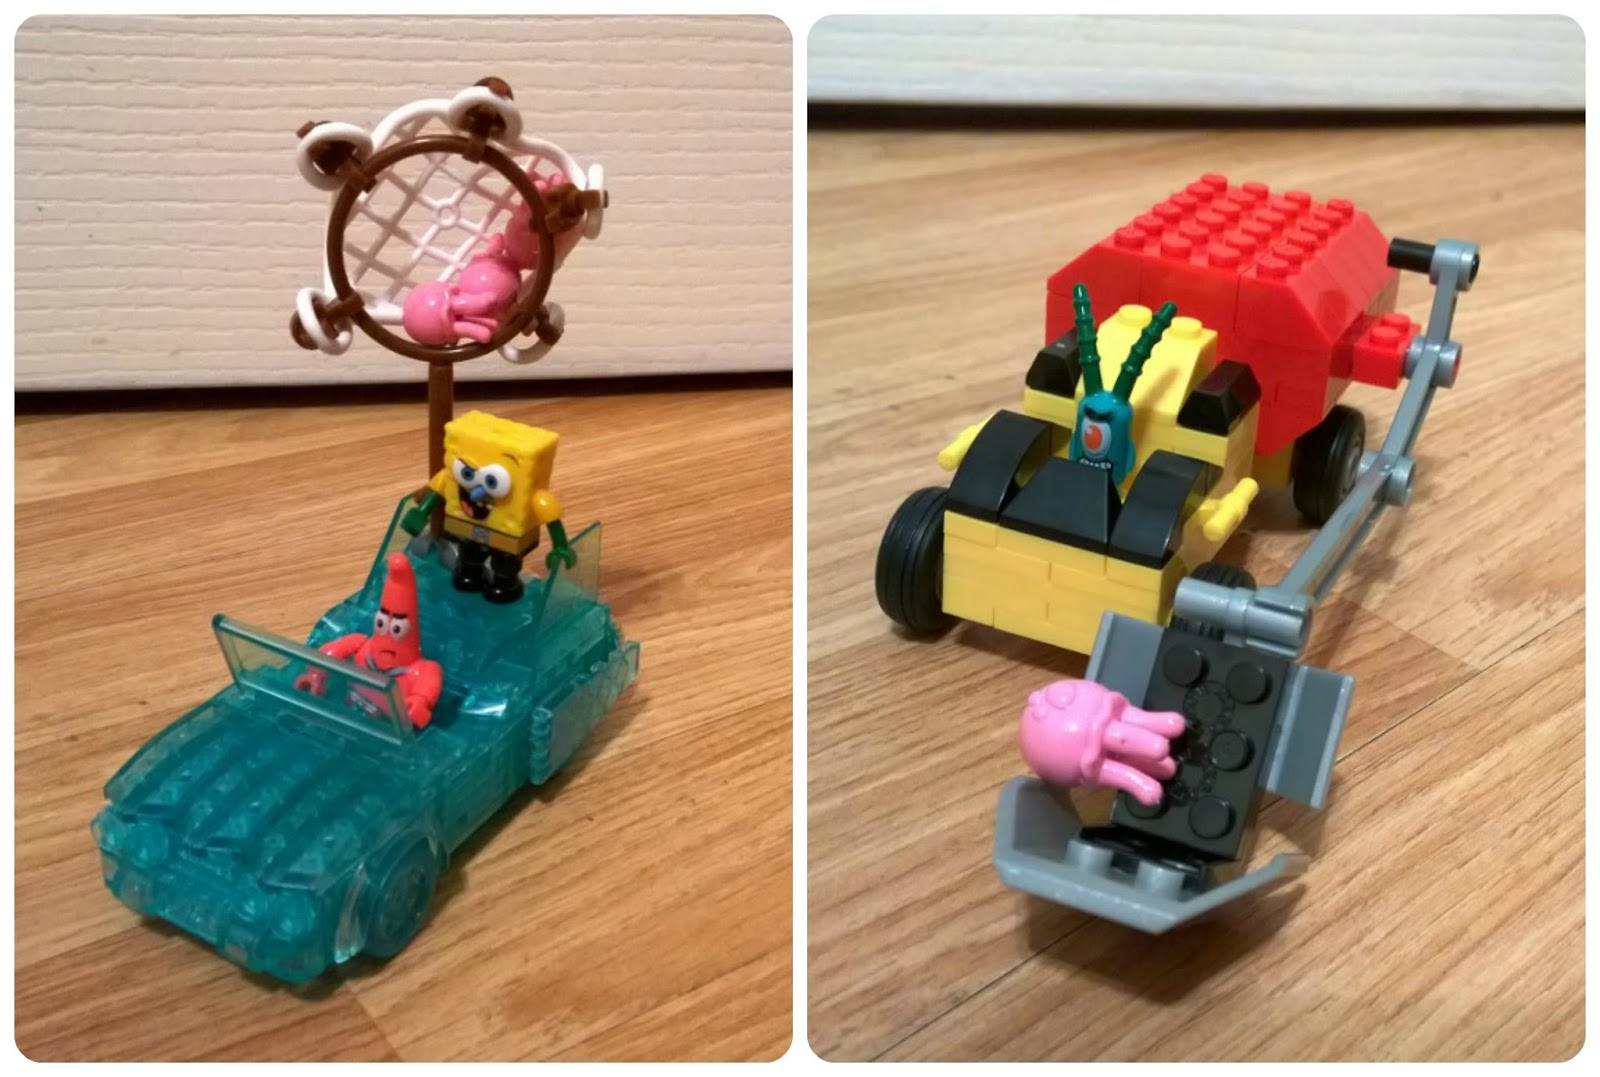 SpongeBob SquarePants Invisible Boatmobile Rescue